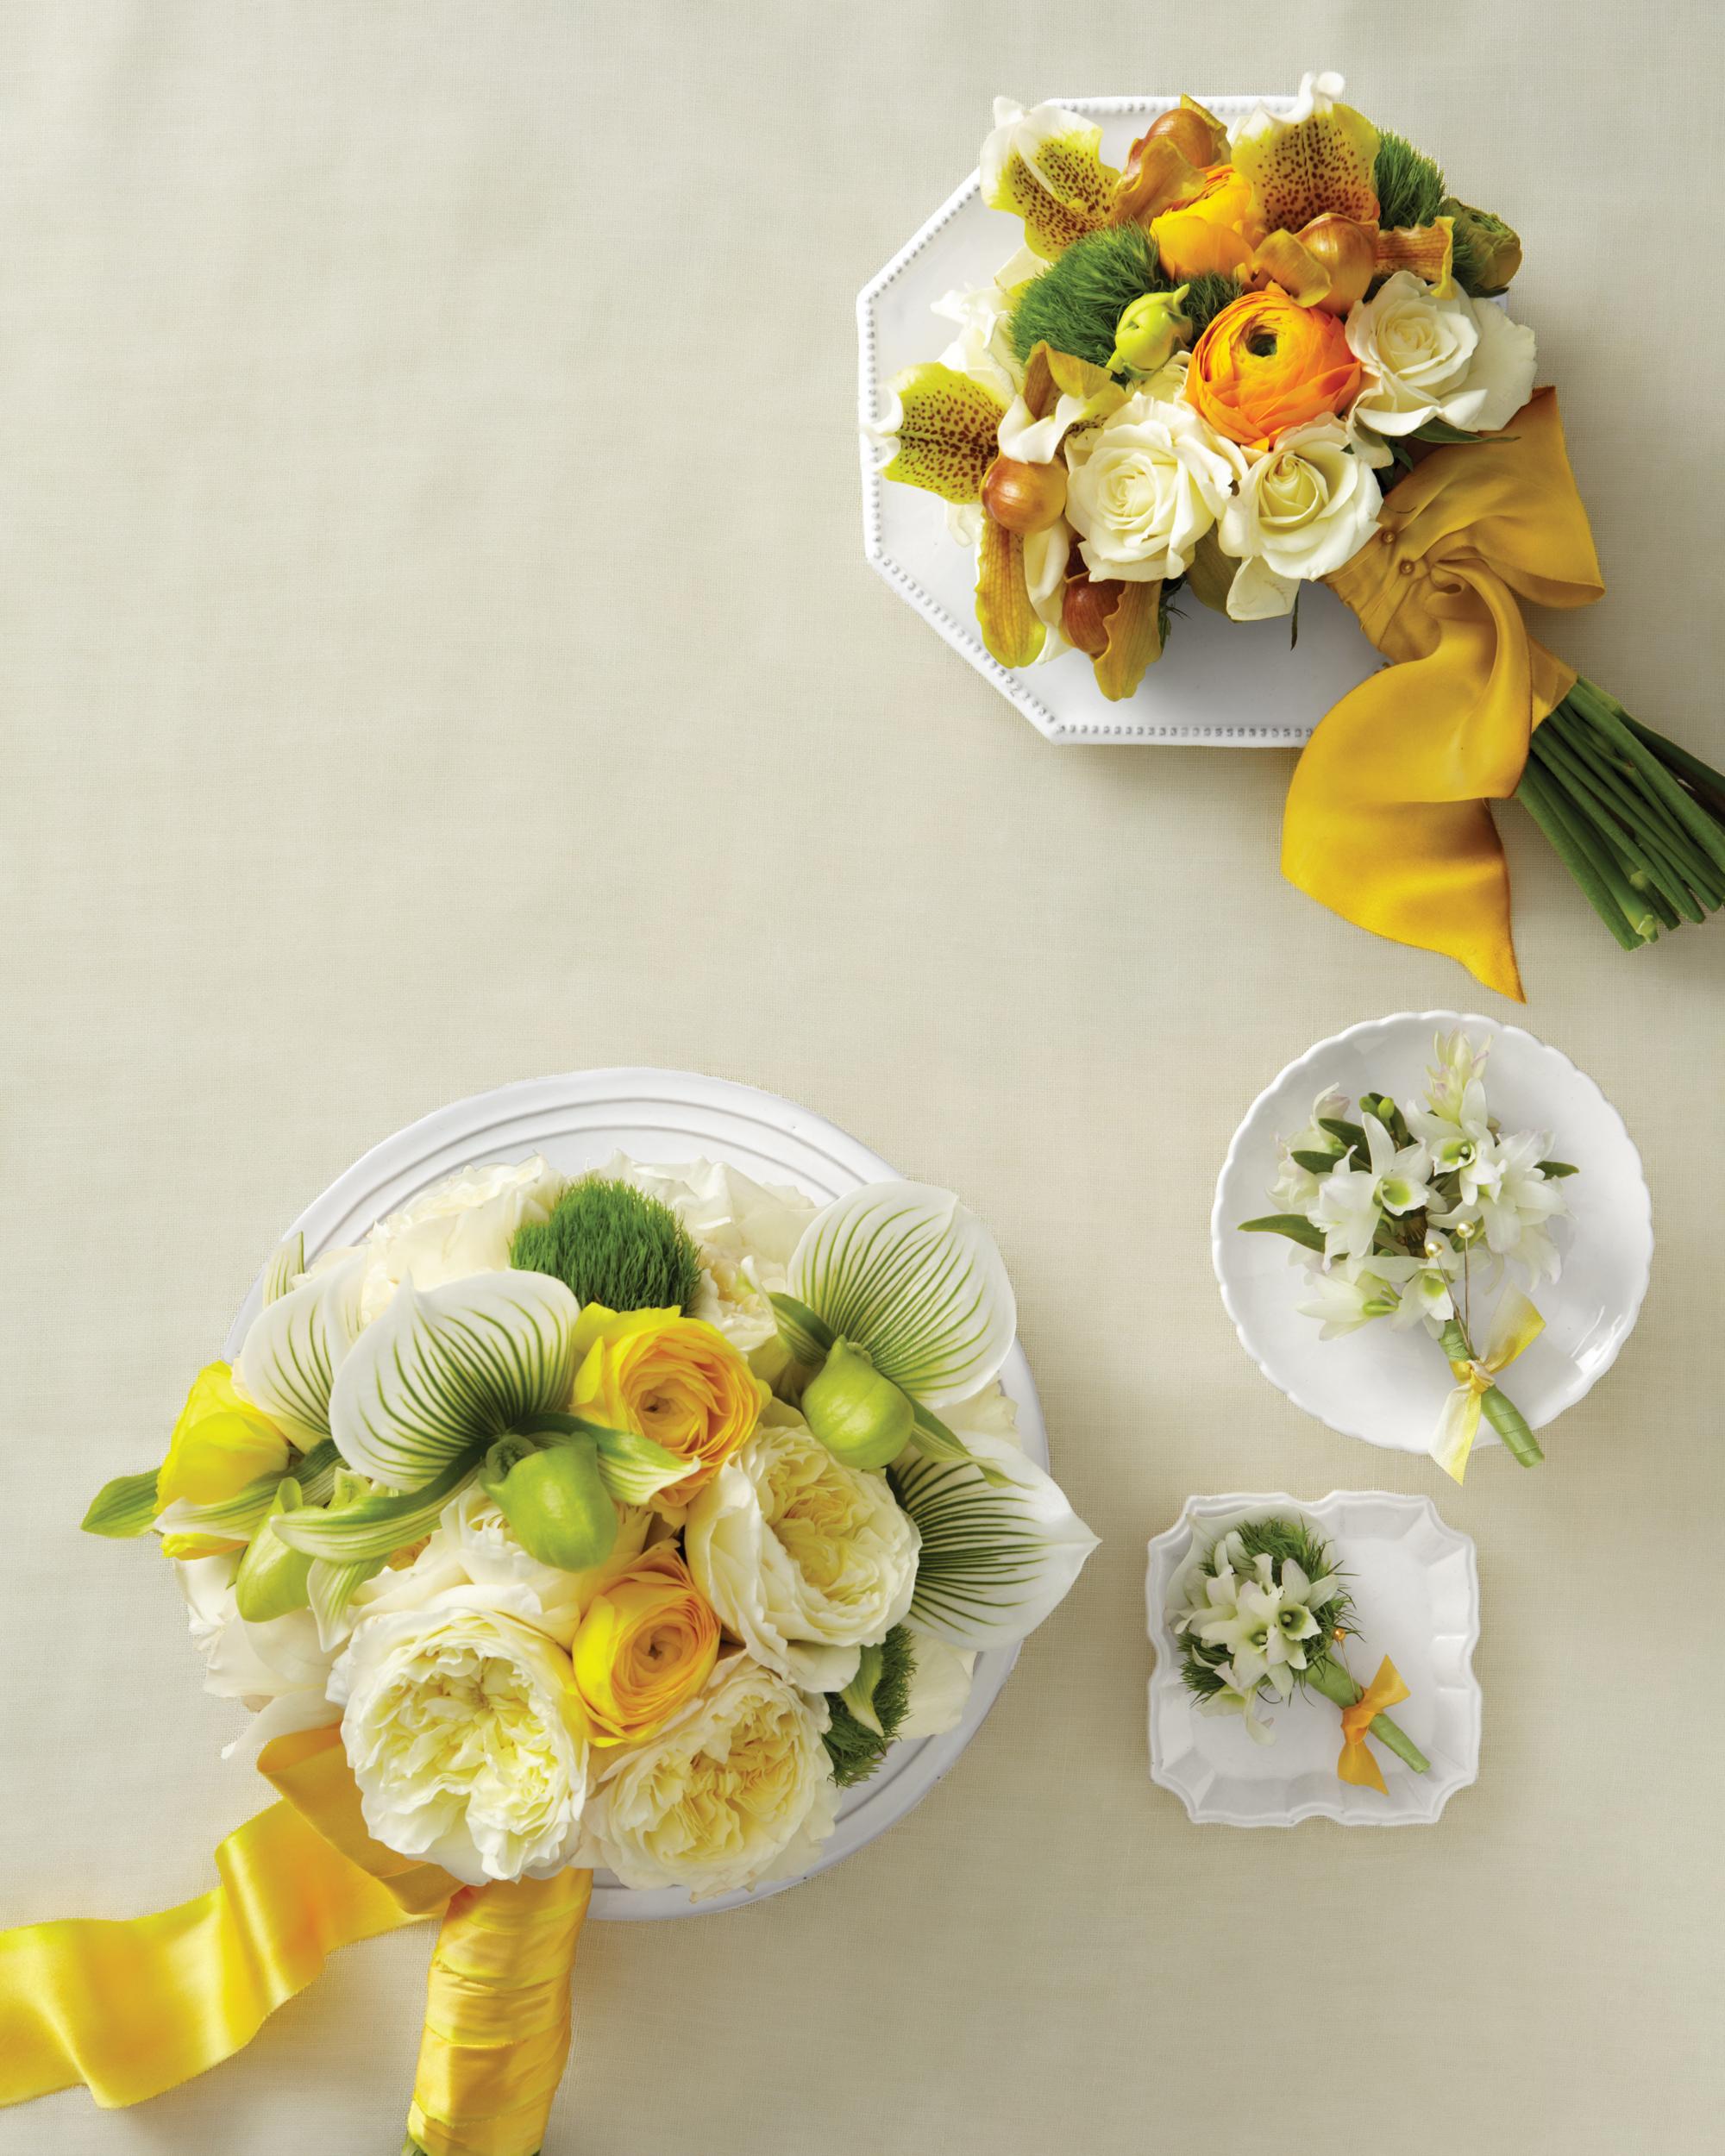 bouquets-sum11mwd107184.jpg